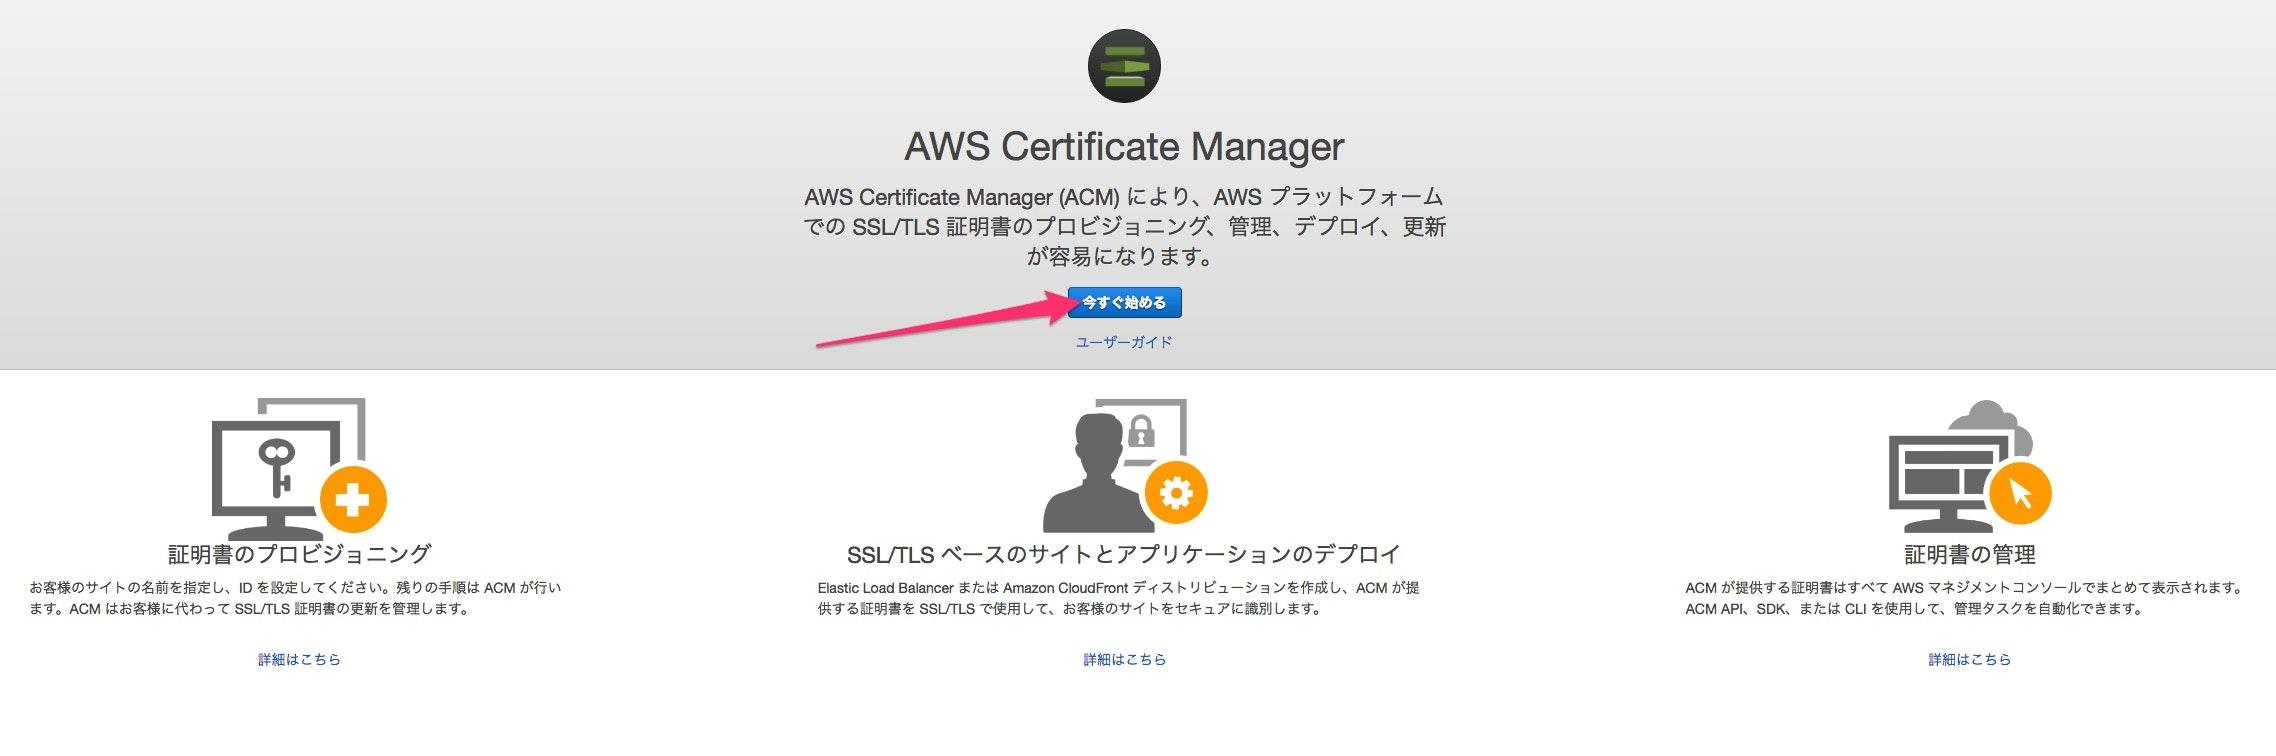 AWS_Certificate_Manager.jpg